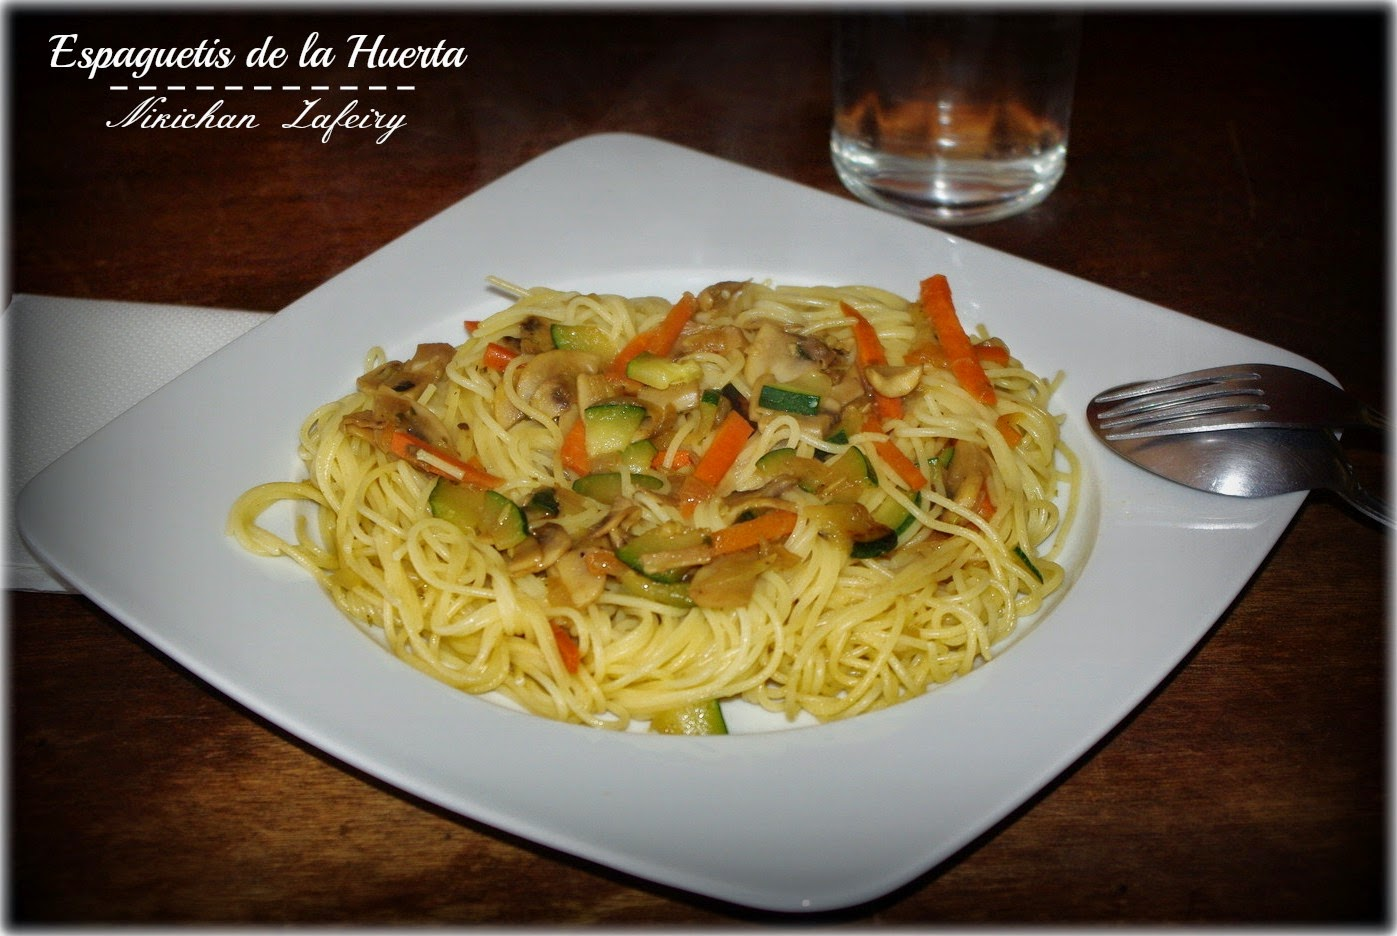 Espaguetis de la huerta dieta recetas de una gatita for Espaguetis para dos